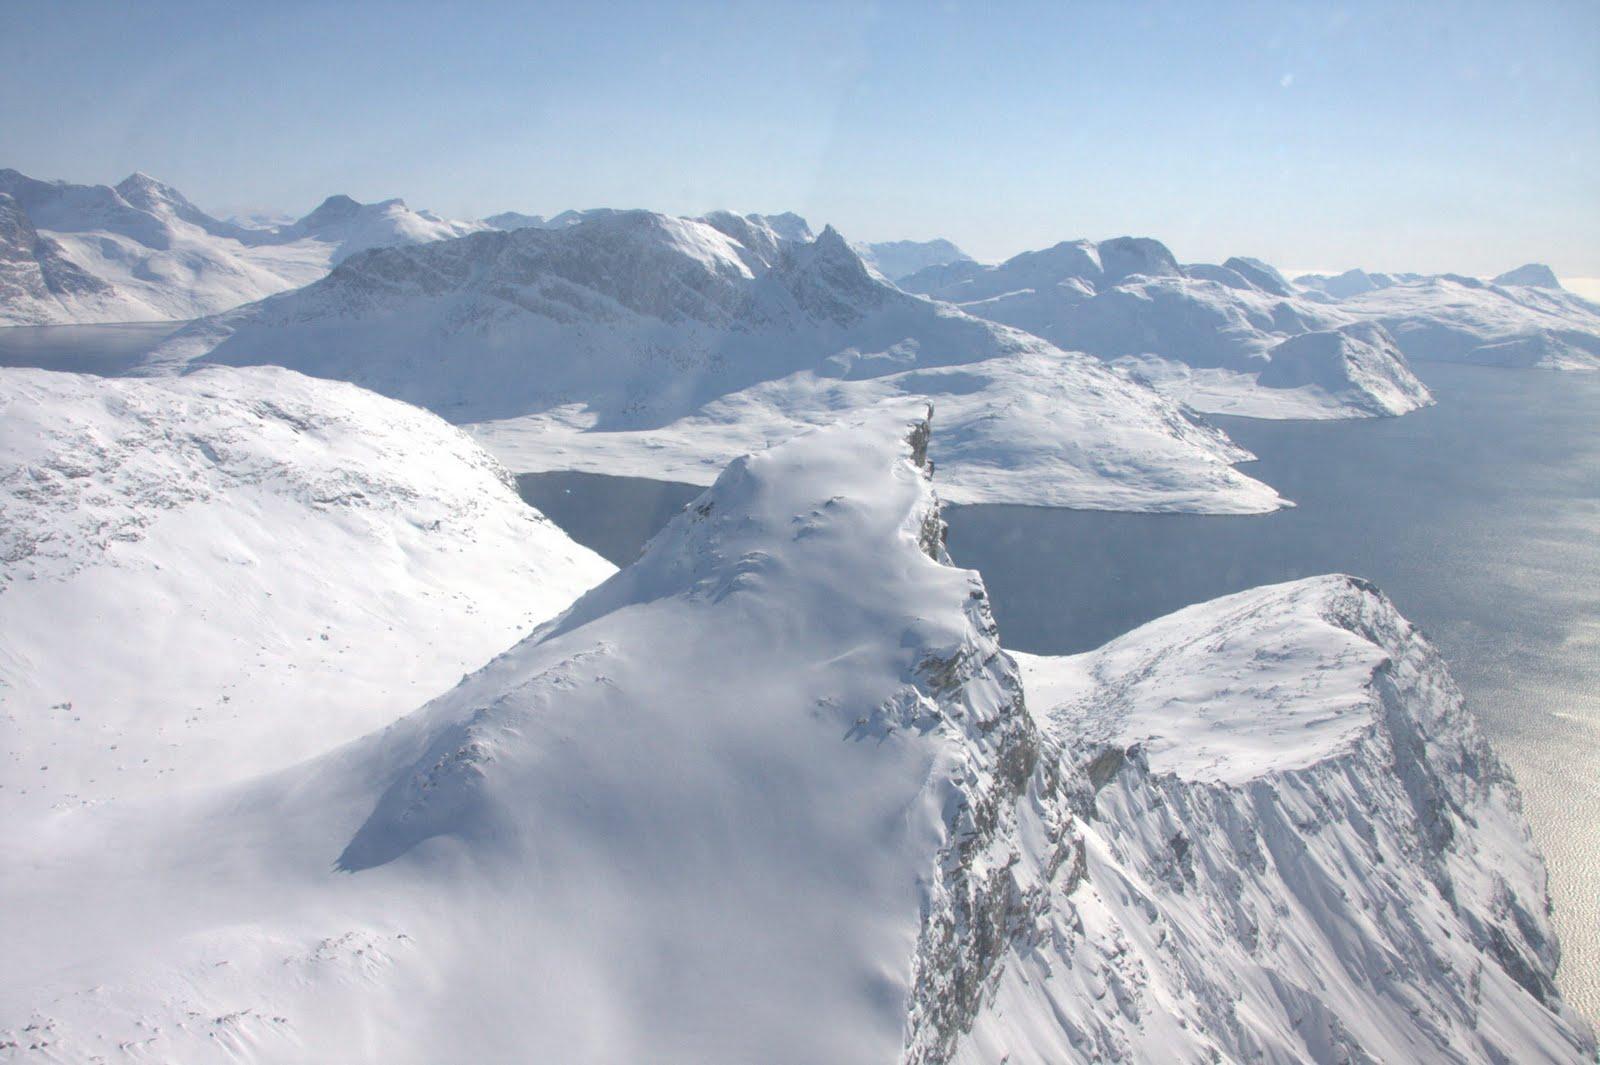 NuukFjords グリーンランドの氷下に巨大な渓谷を確認!大きさはグランドキャニオンの2倍!